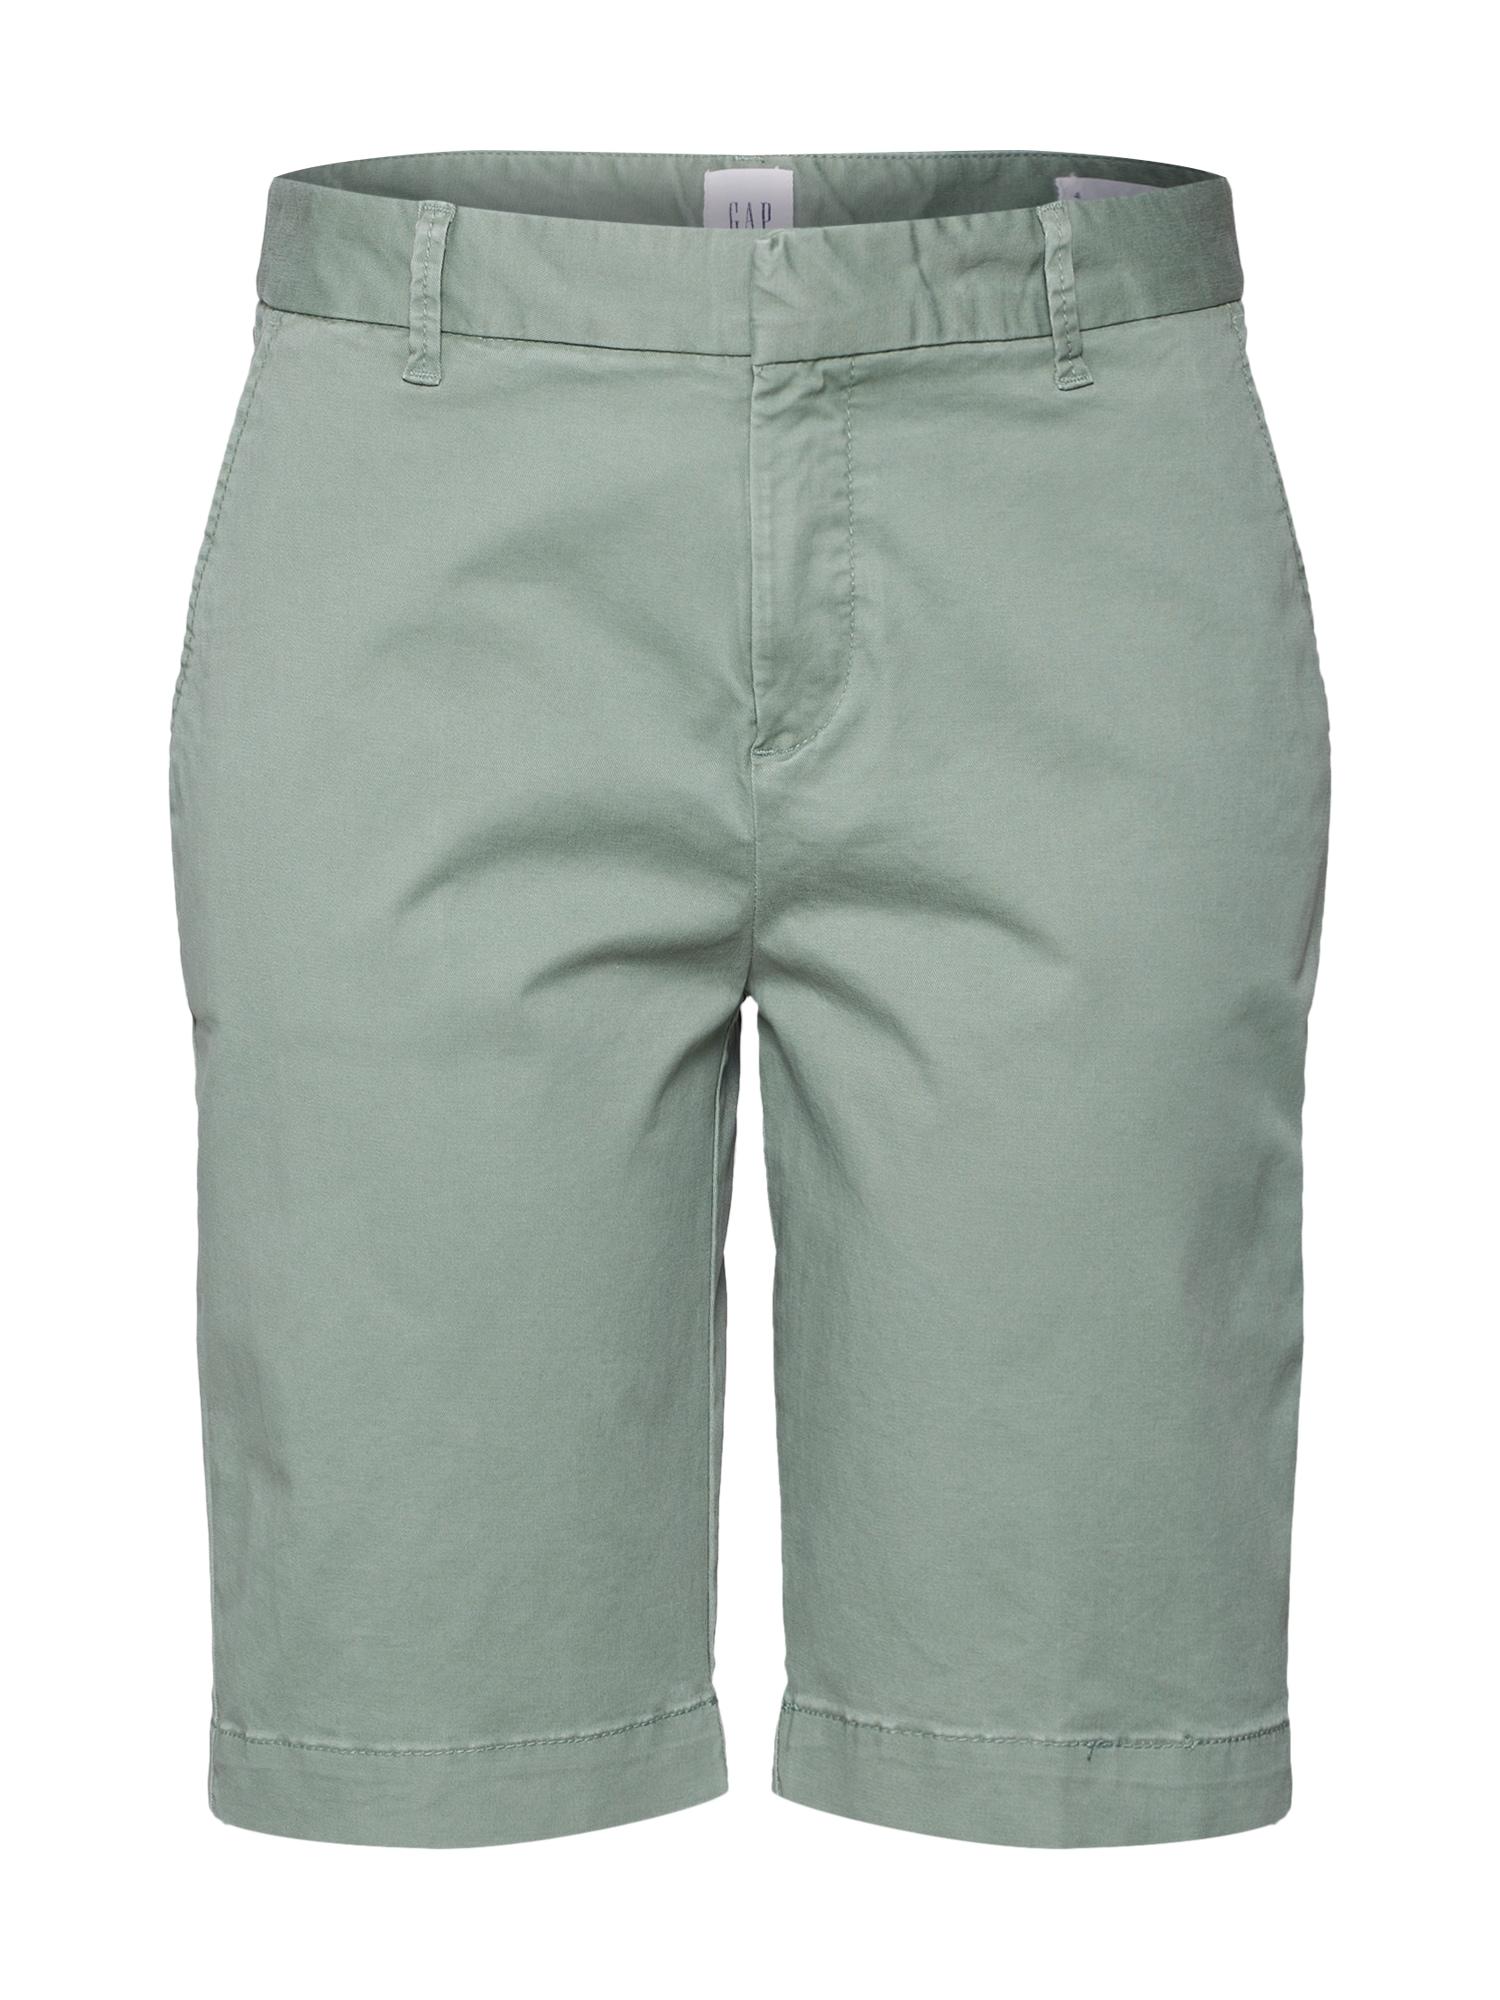 Hose 'SH 10 INCH BERMUDA SHORT' | Bekleidung > Jeans > Shorts & Bermudas | GAP